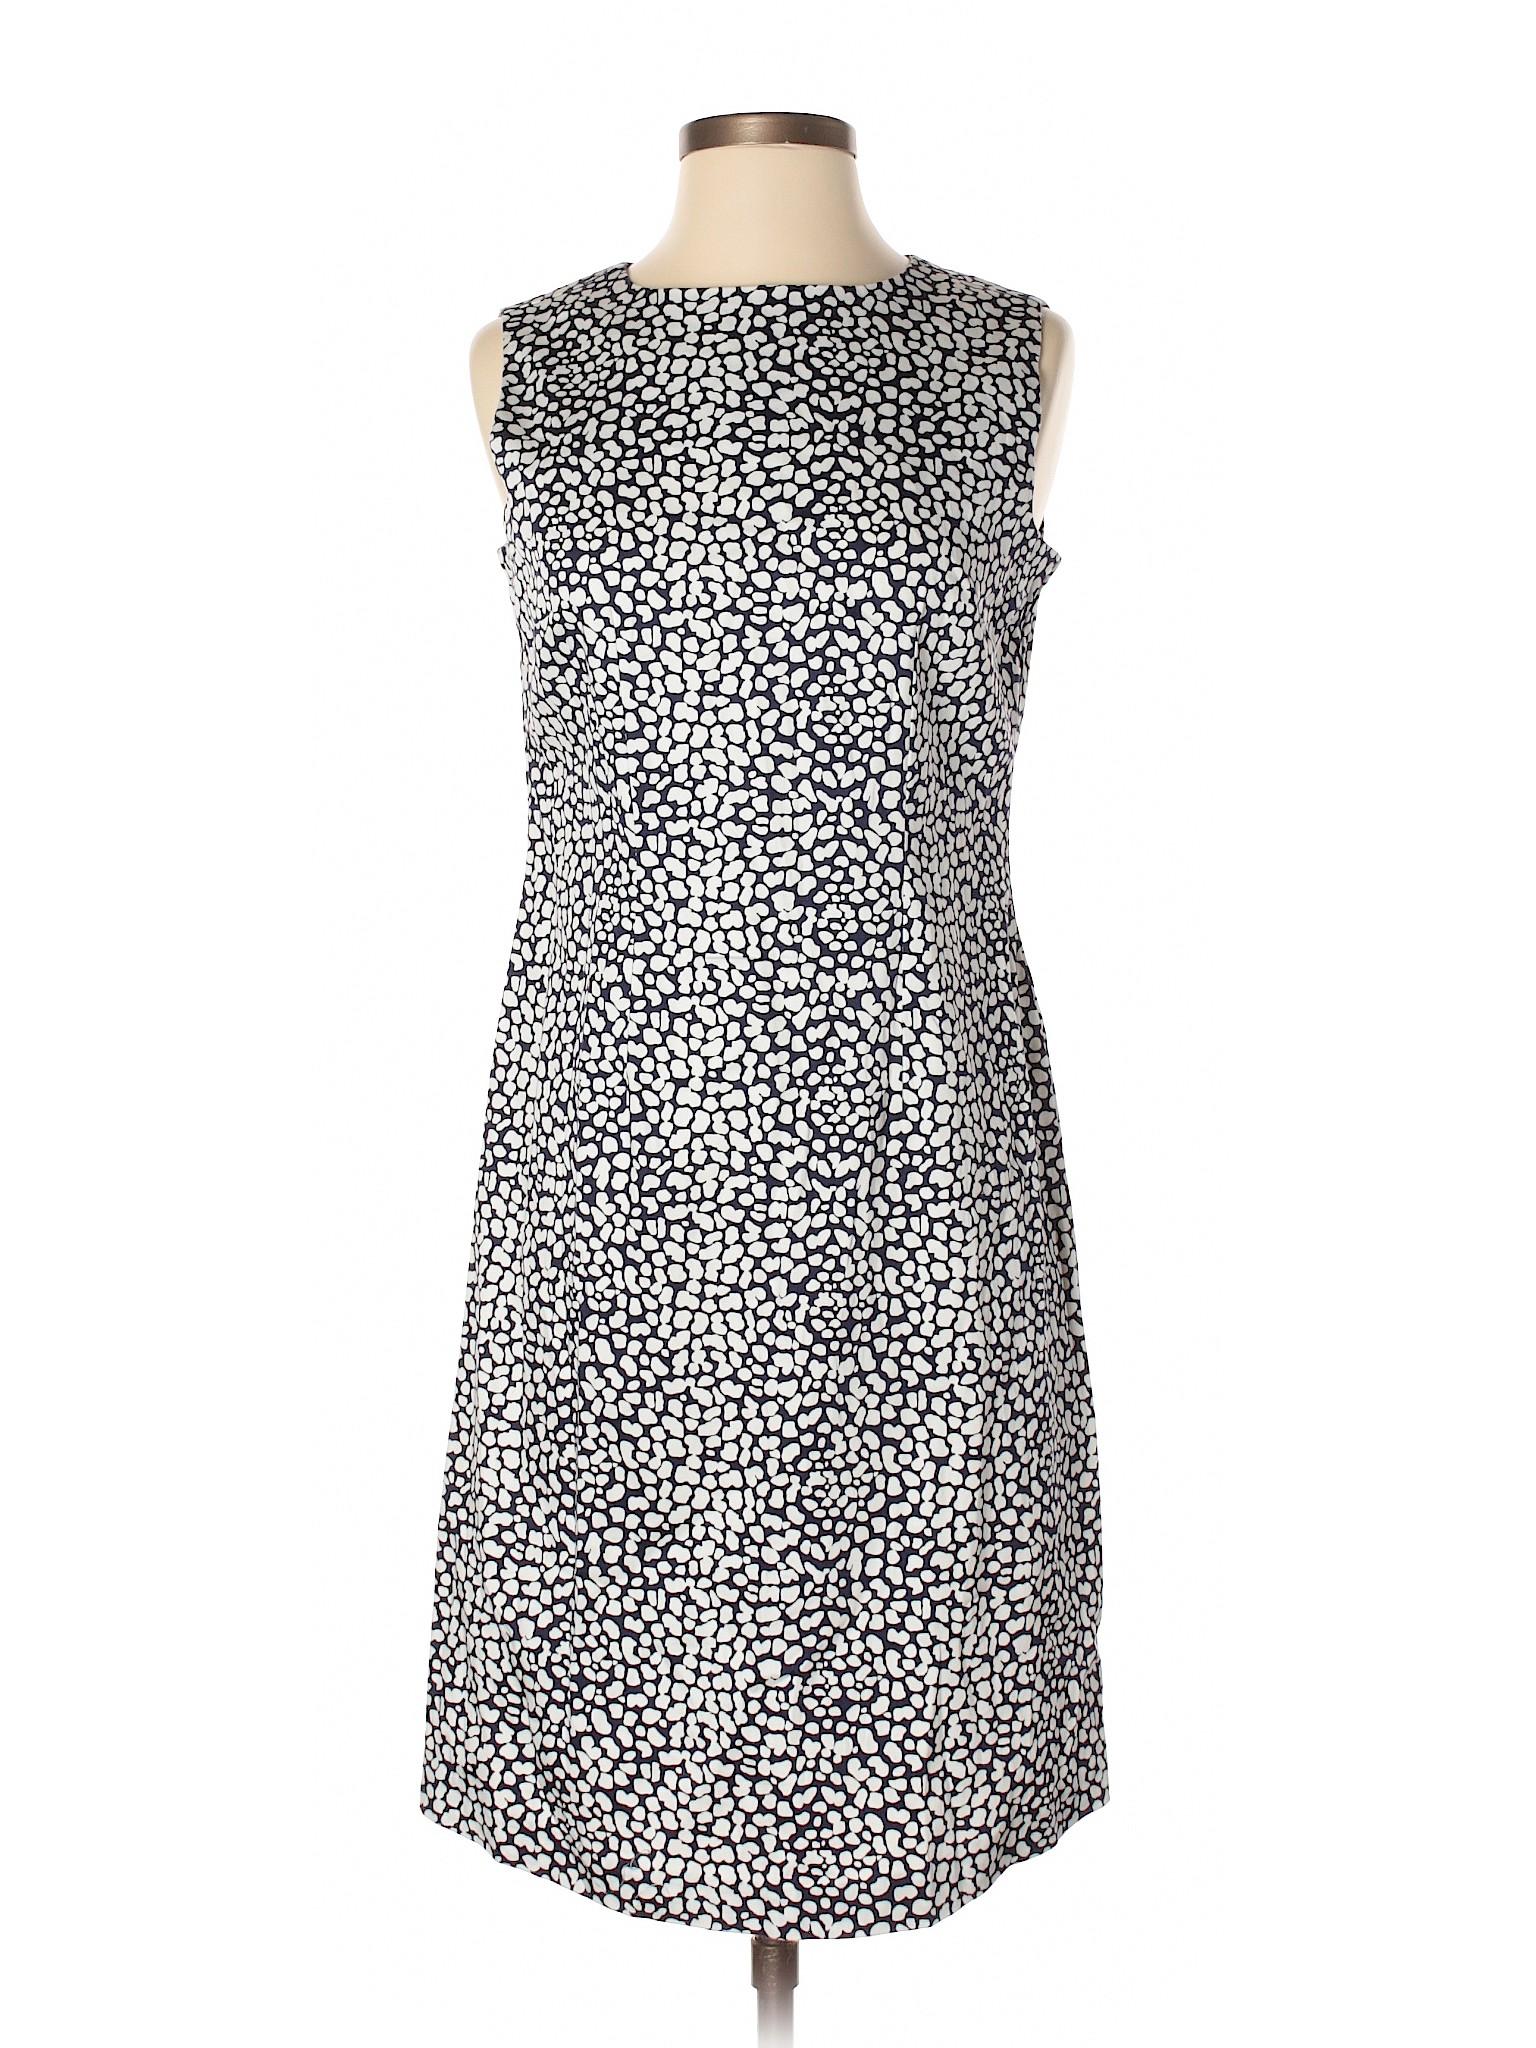 Maglia Selling Maglia Dress Maglia Dress Selling Selling Casual Casual wtqRPT5xnv